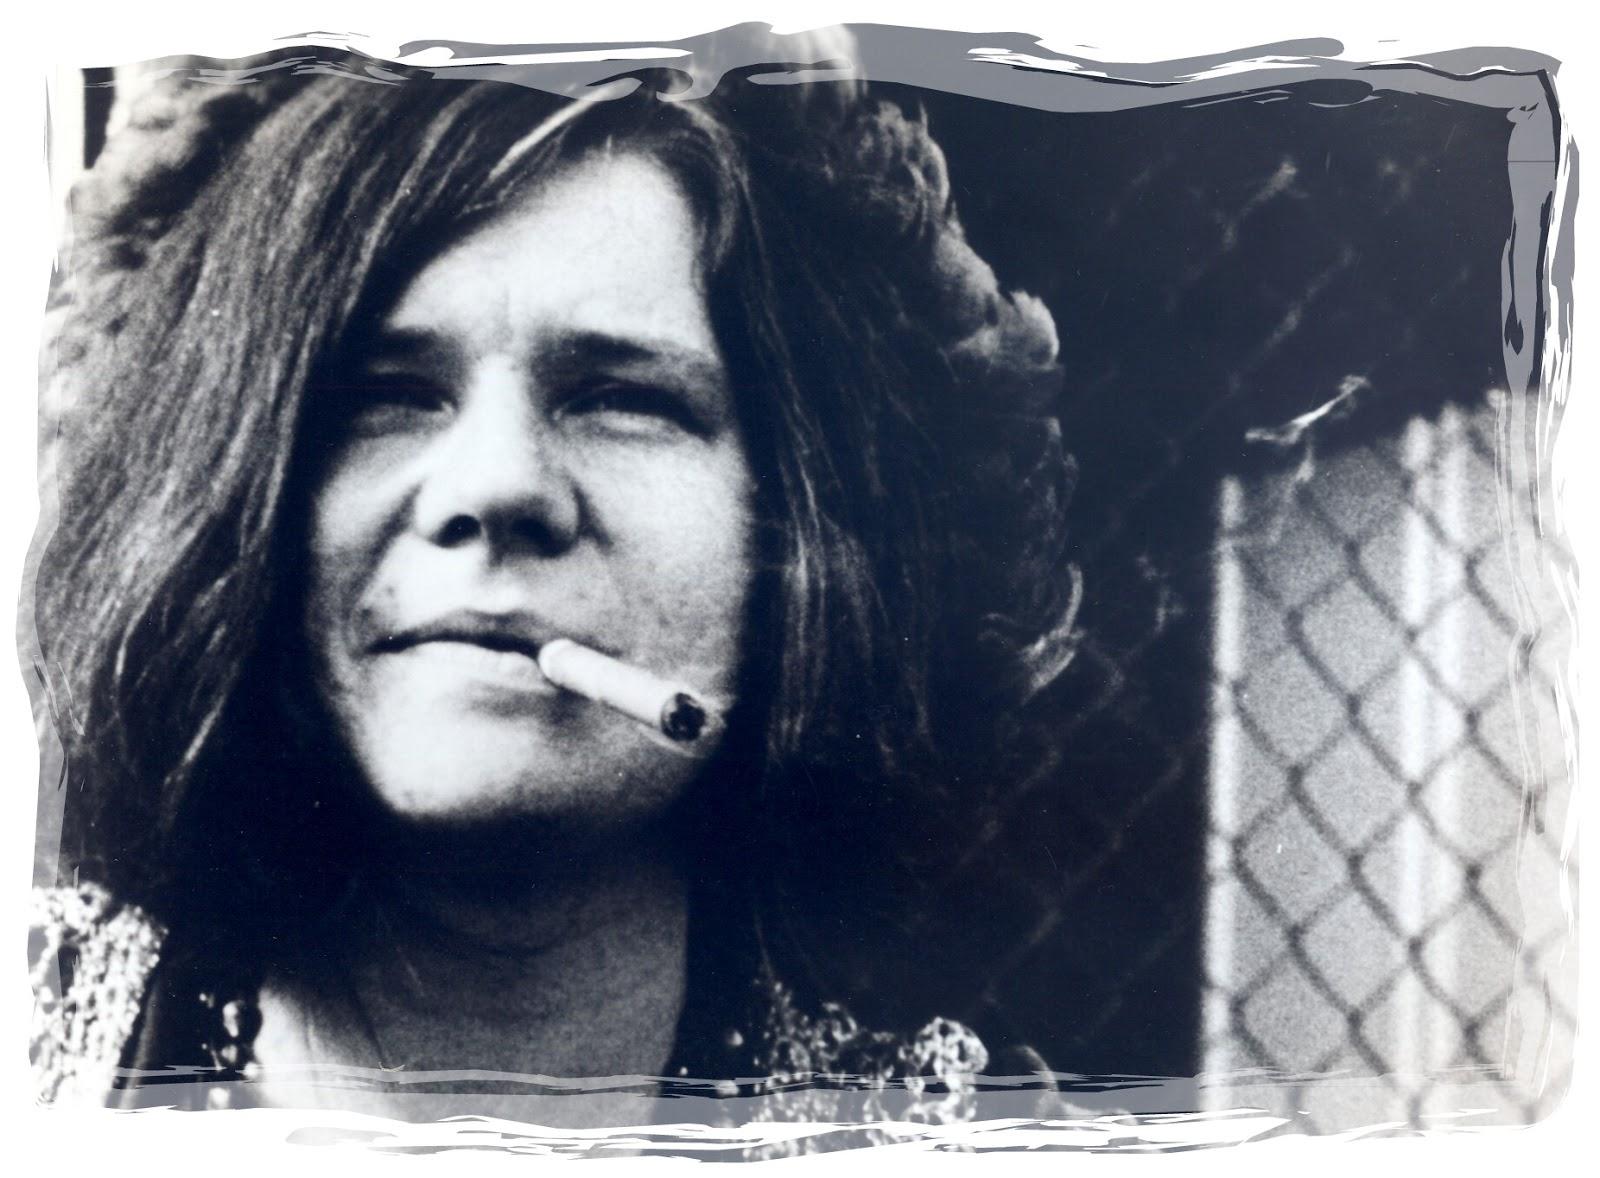 Janis+Joplin+SB+457_1.jpg